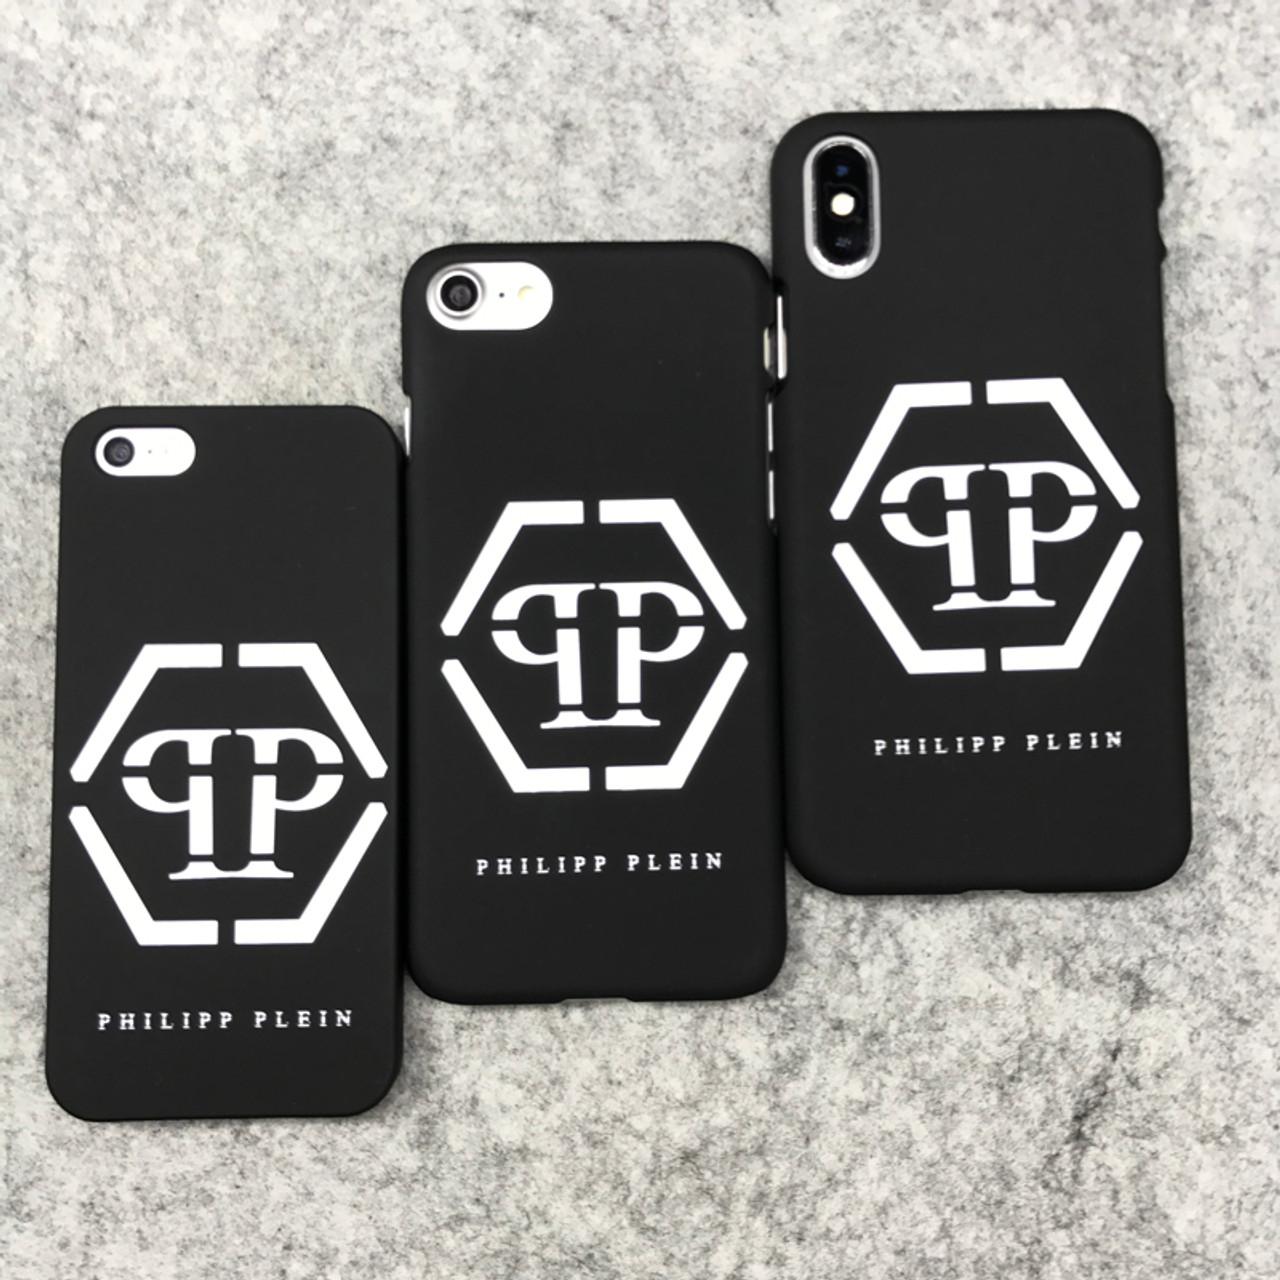 Newest fashion PHILIPP PLEIN Matte hard plastic cover case for iphone 5 5S SE 6 6S 16429.1531912343